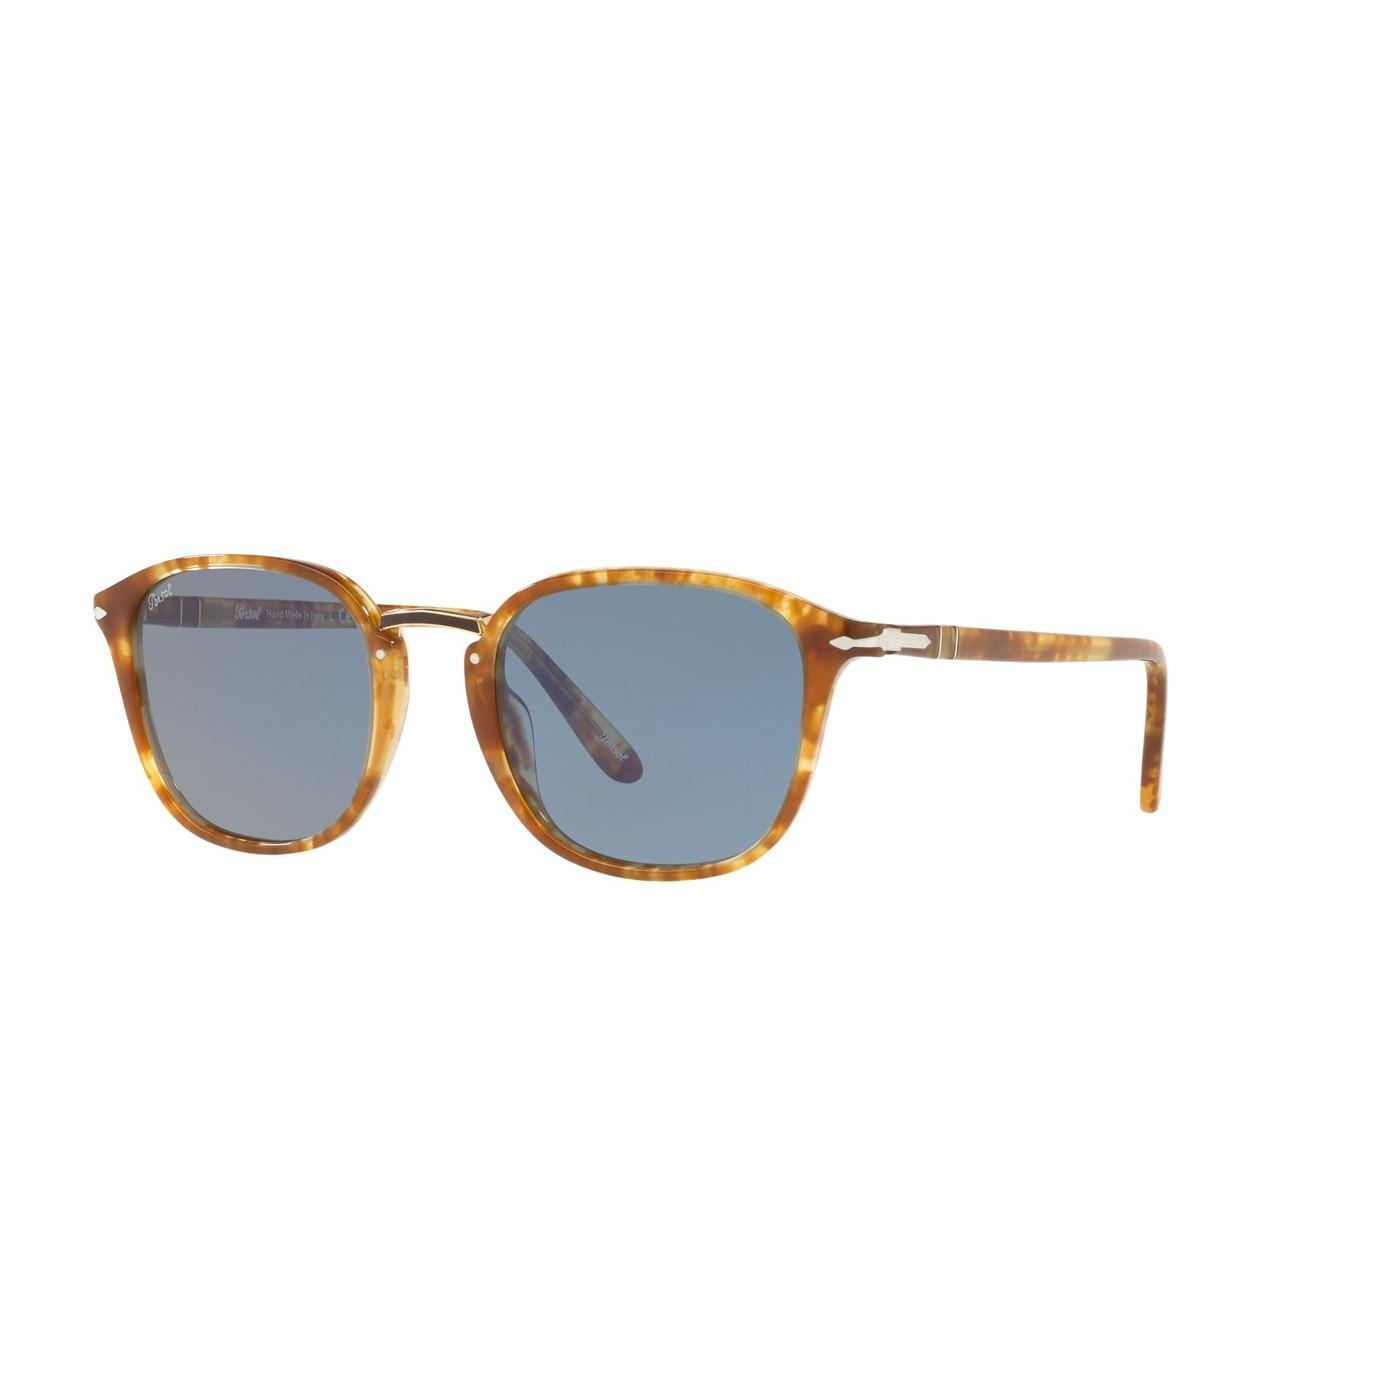 c57274de8e Persol Spotted Brown Beige Gafas de Sol PO3186S10645651 - Gafas de sol